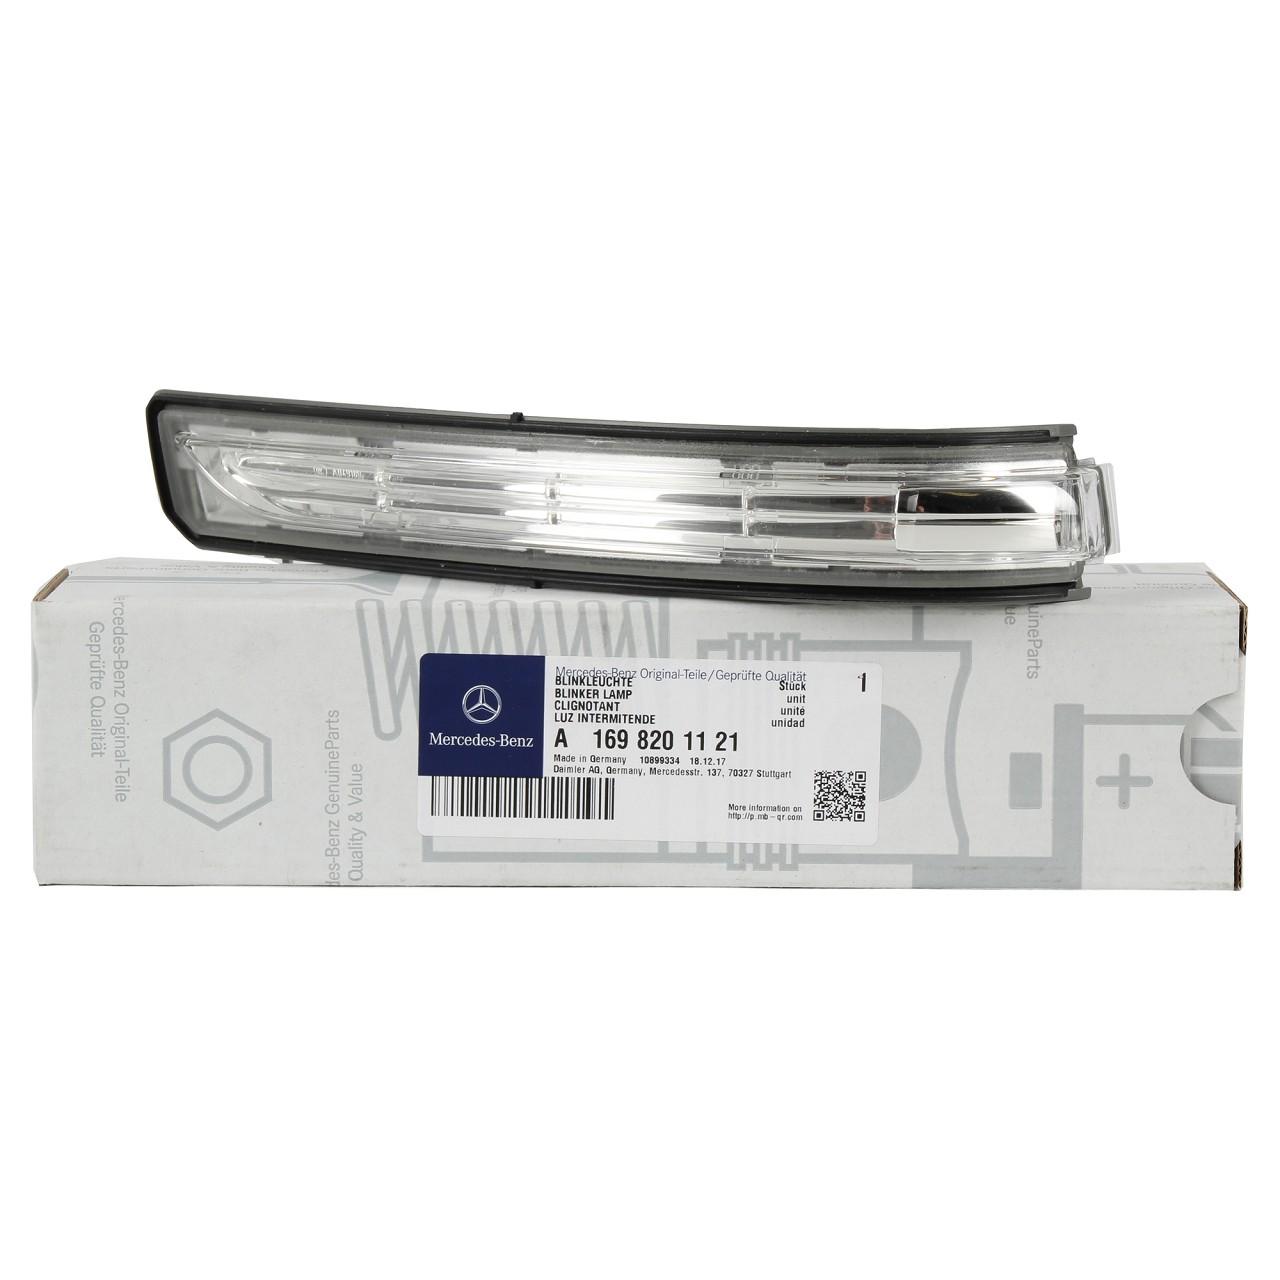 ORIGINAL Mercedes Blinkleuchte Außenspiegel LED W169 W245 links 1698201121